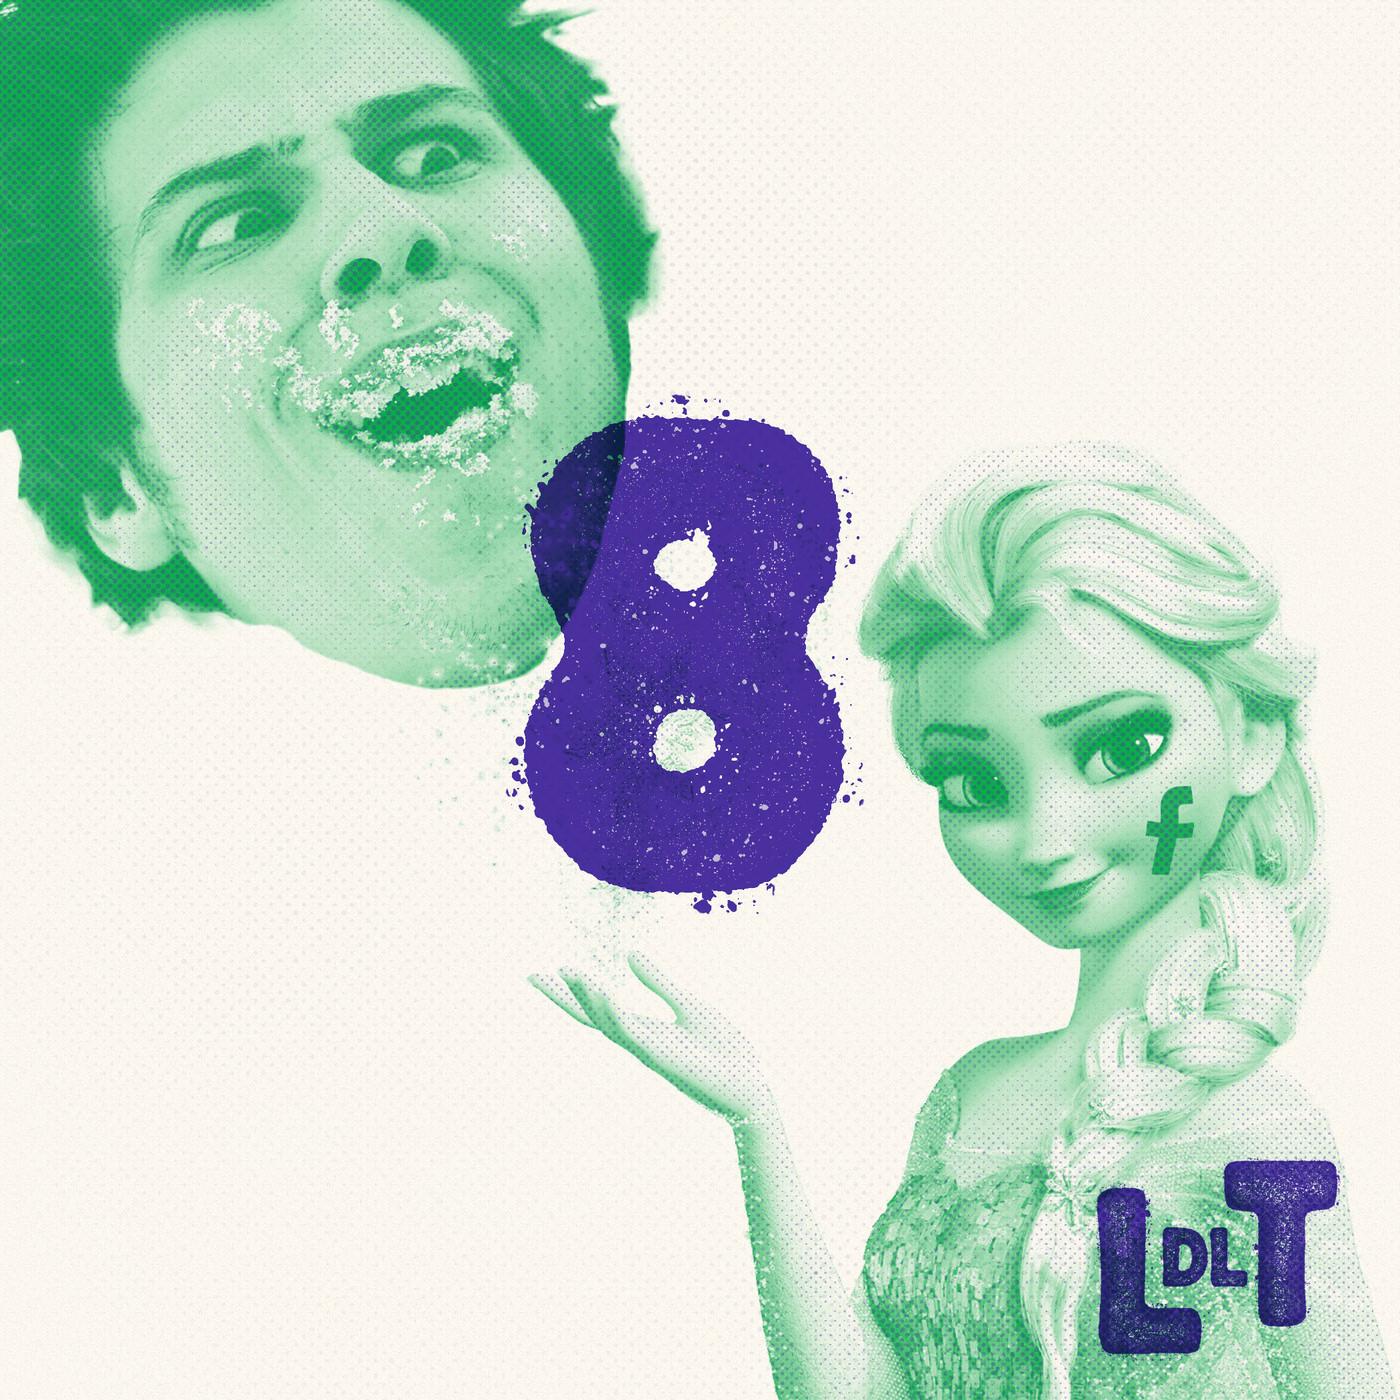 LDLT 08 - Donald Trump quiere saber qué princesa Disney eres